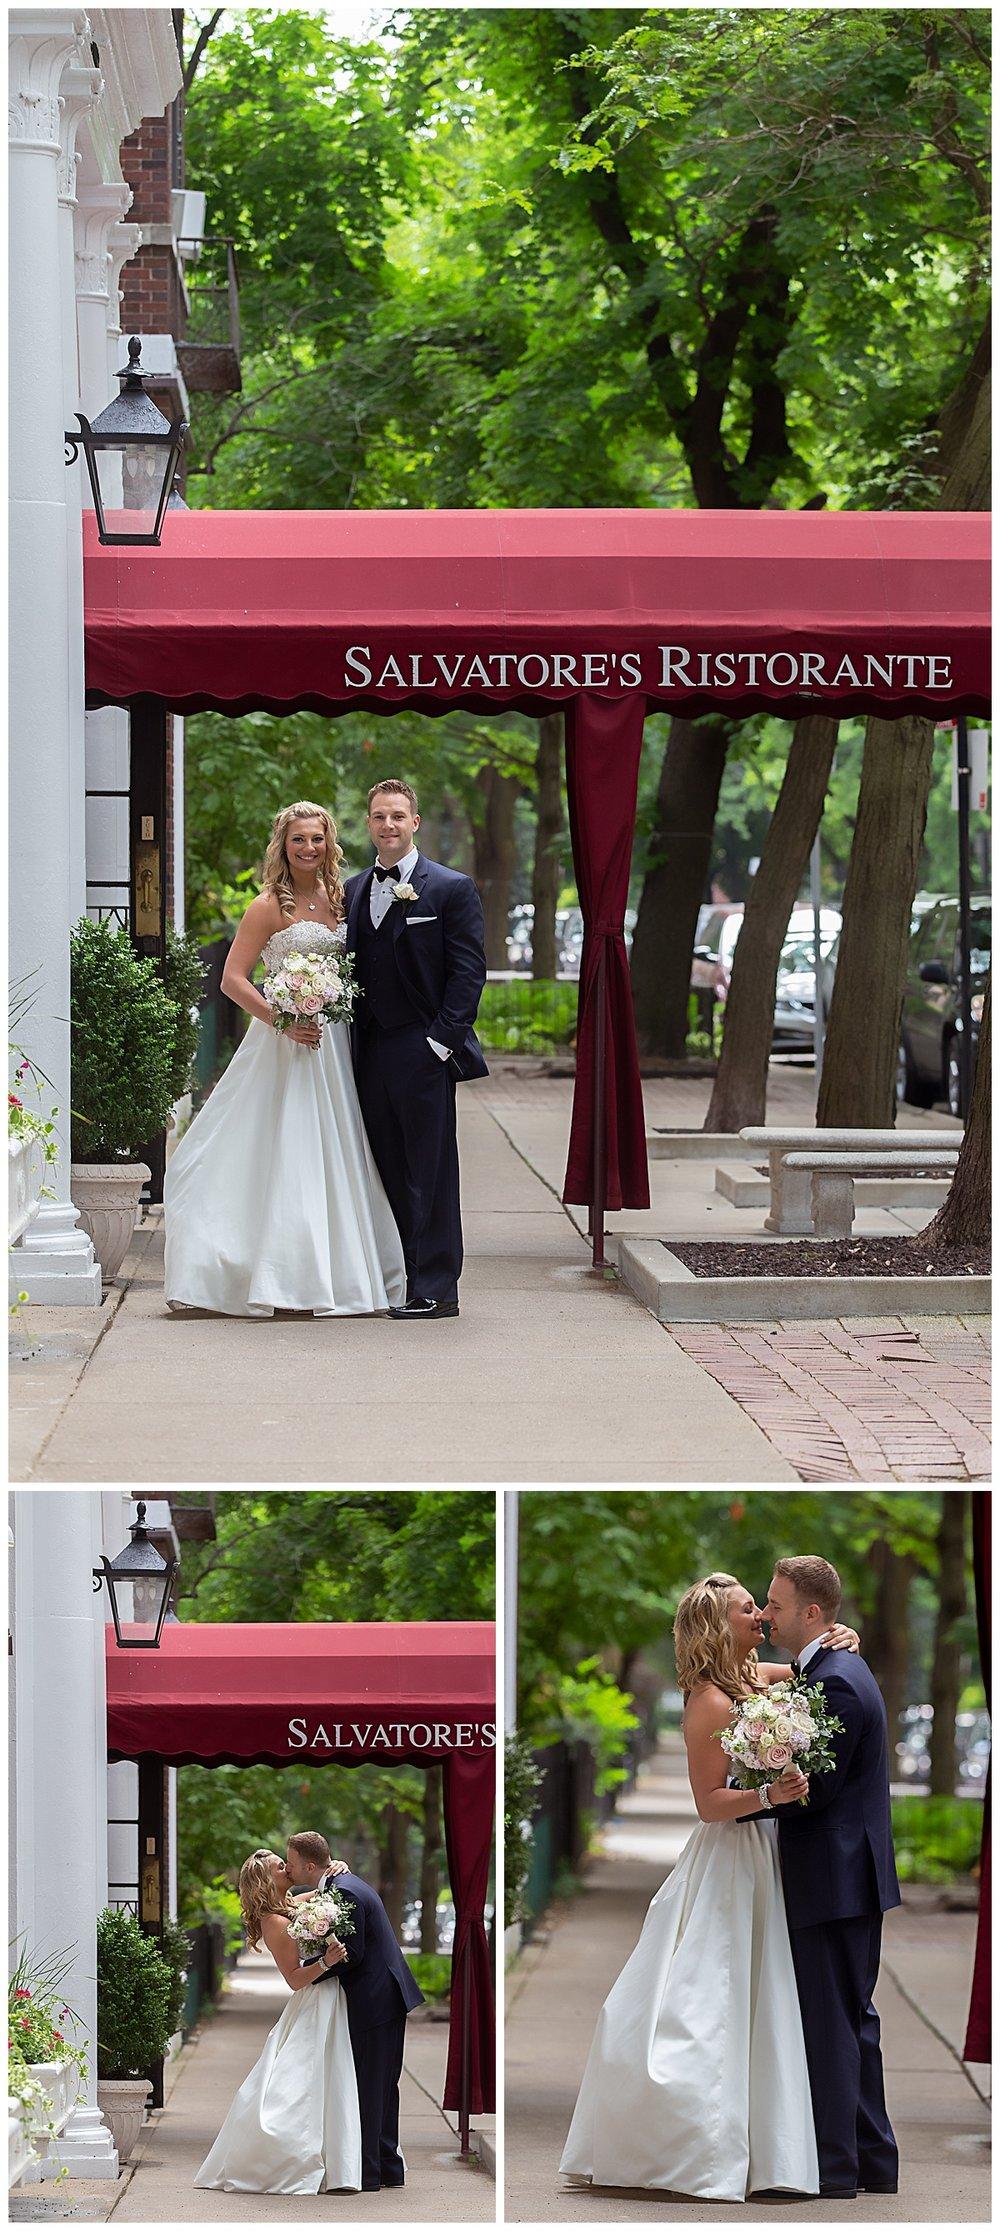 bride and groom outside wedding venue